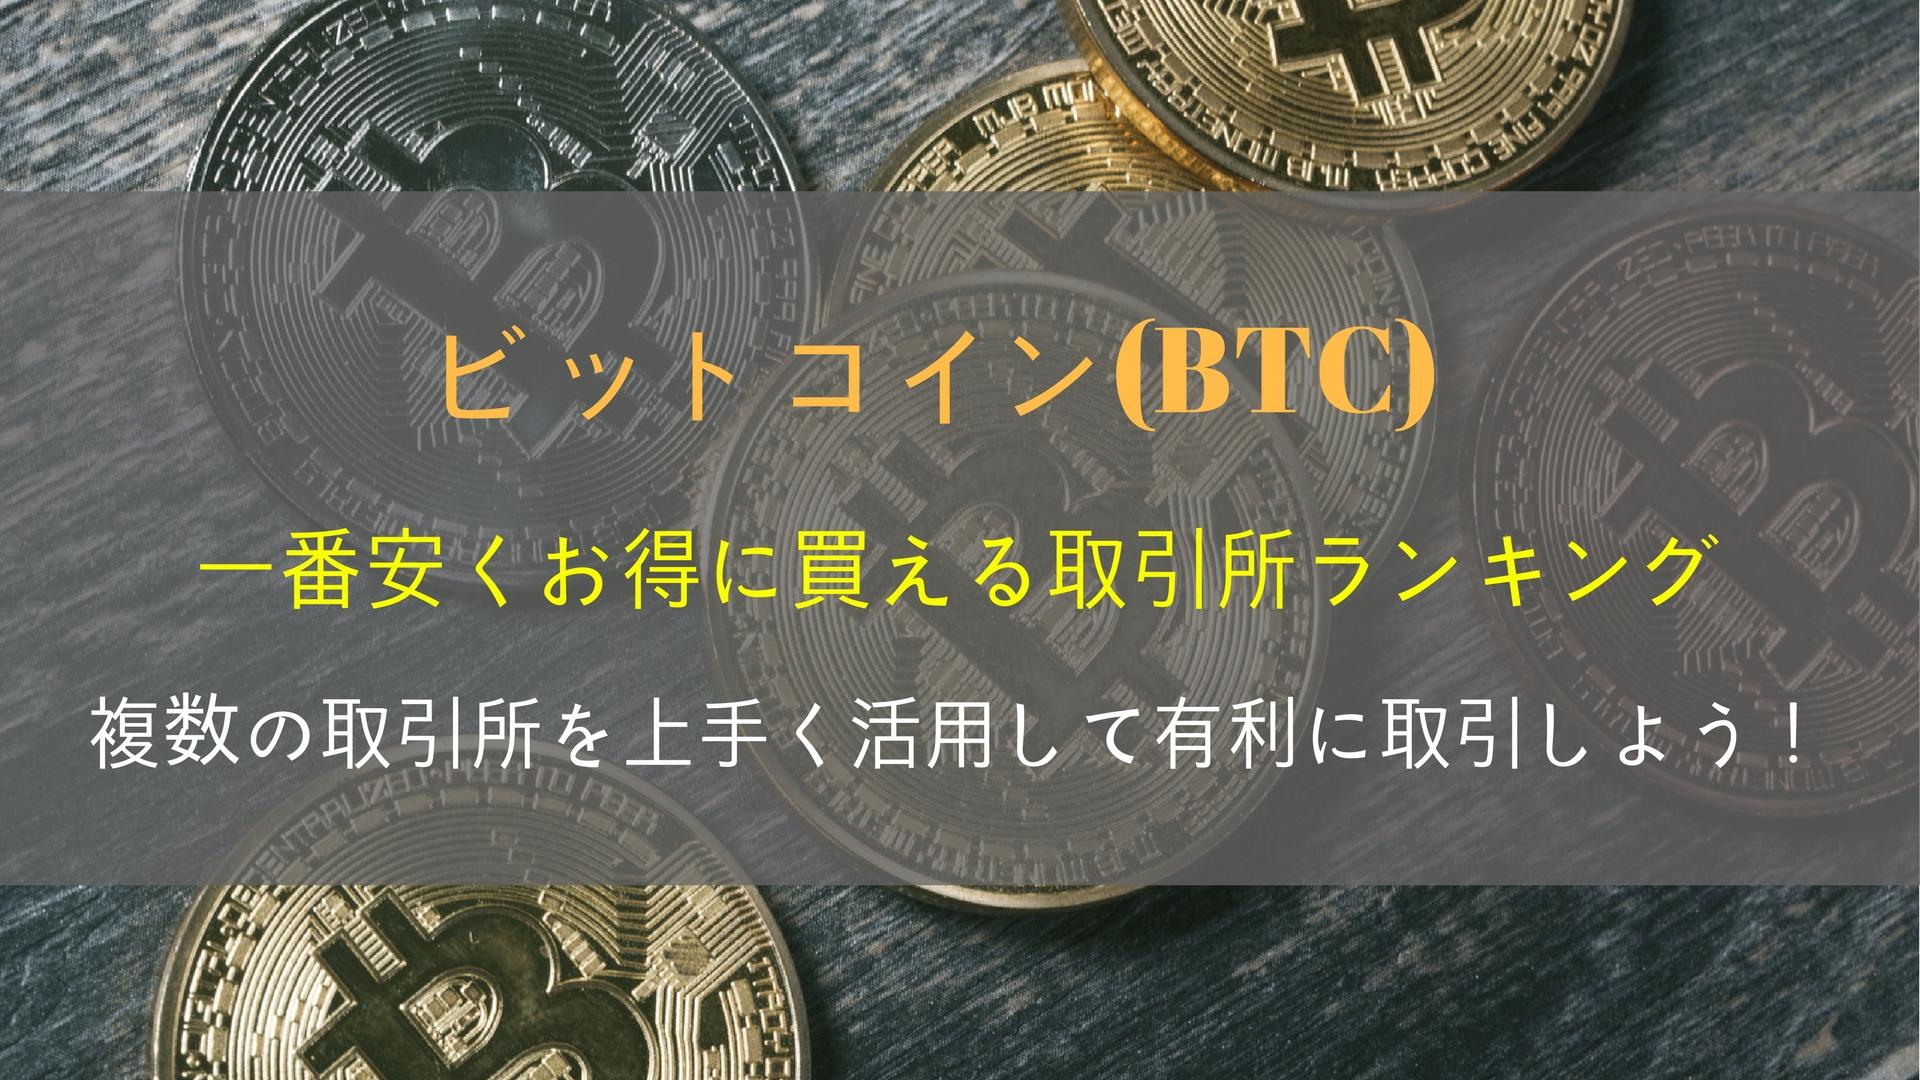 Bitbank(ビットバンク)の送金方法・送金手数料・反映時間を分かりやすく解説 - ゼロからはじめる暗号資産